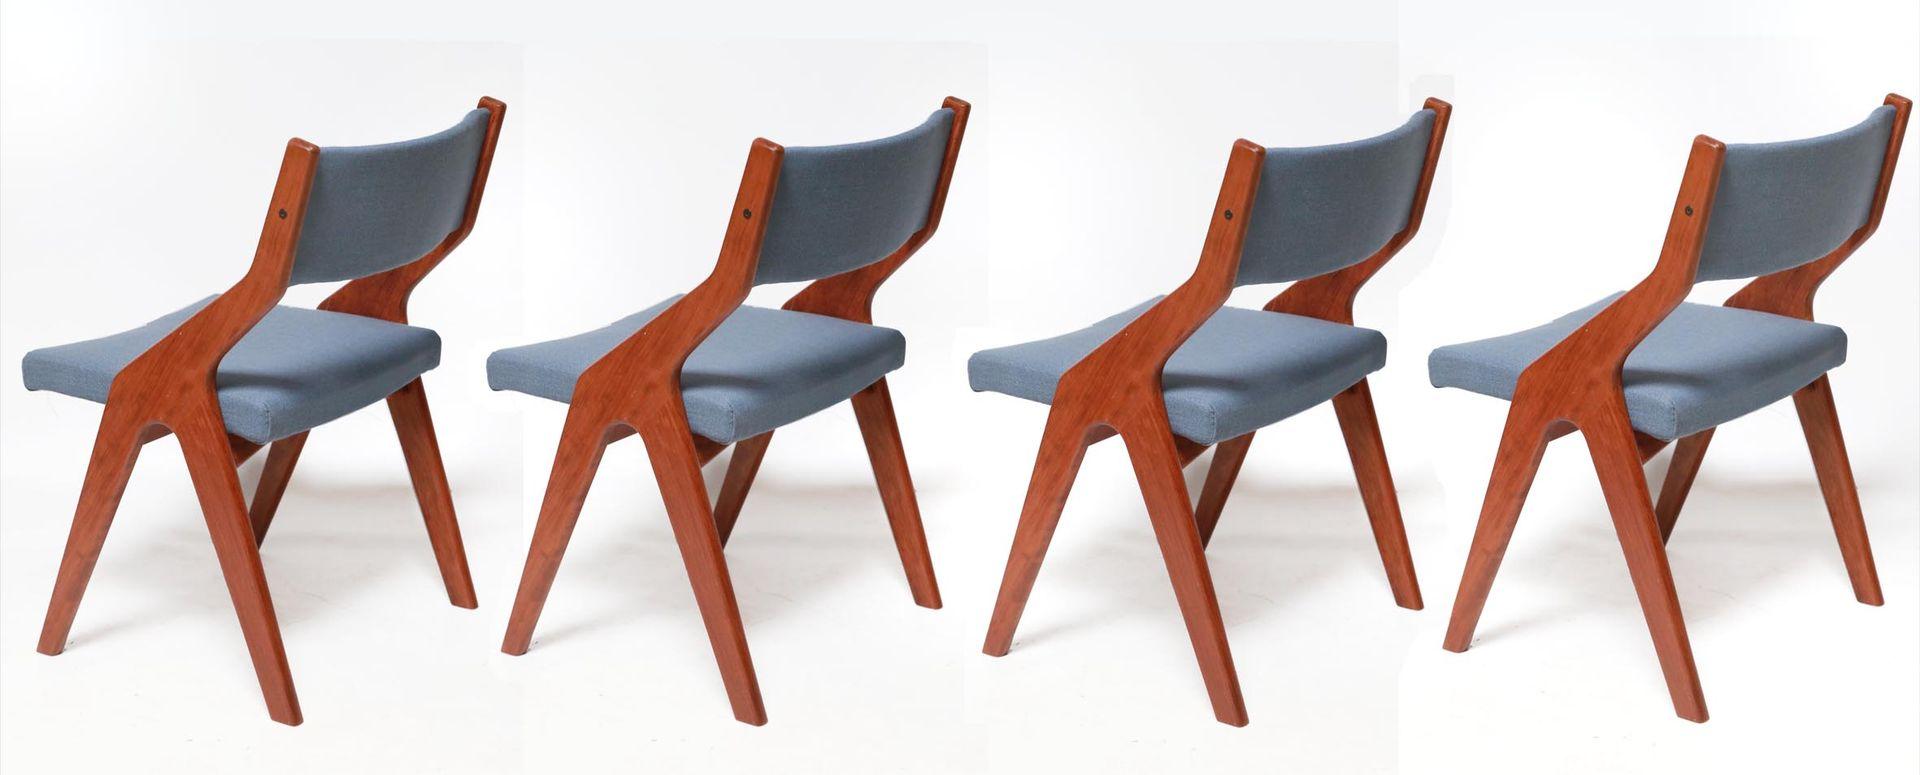 Vintage Danish Teak Wooden Dining Chairs 1960s Set Of 4